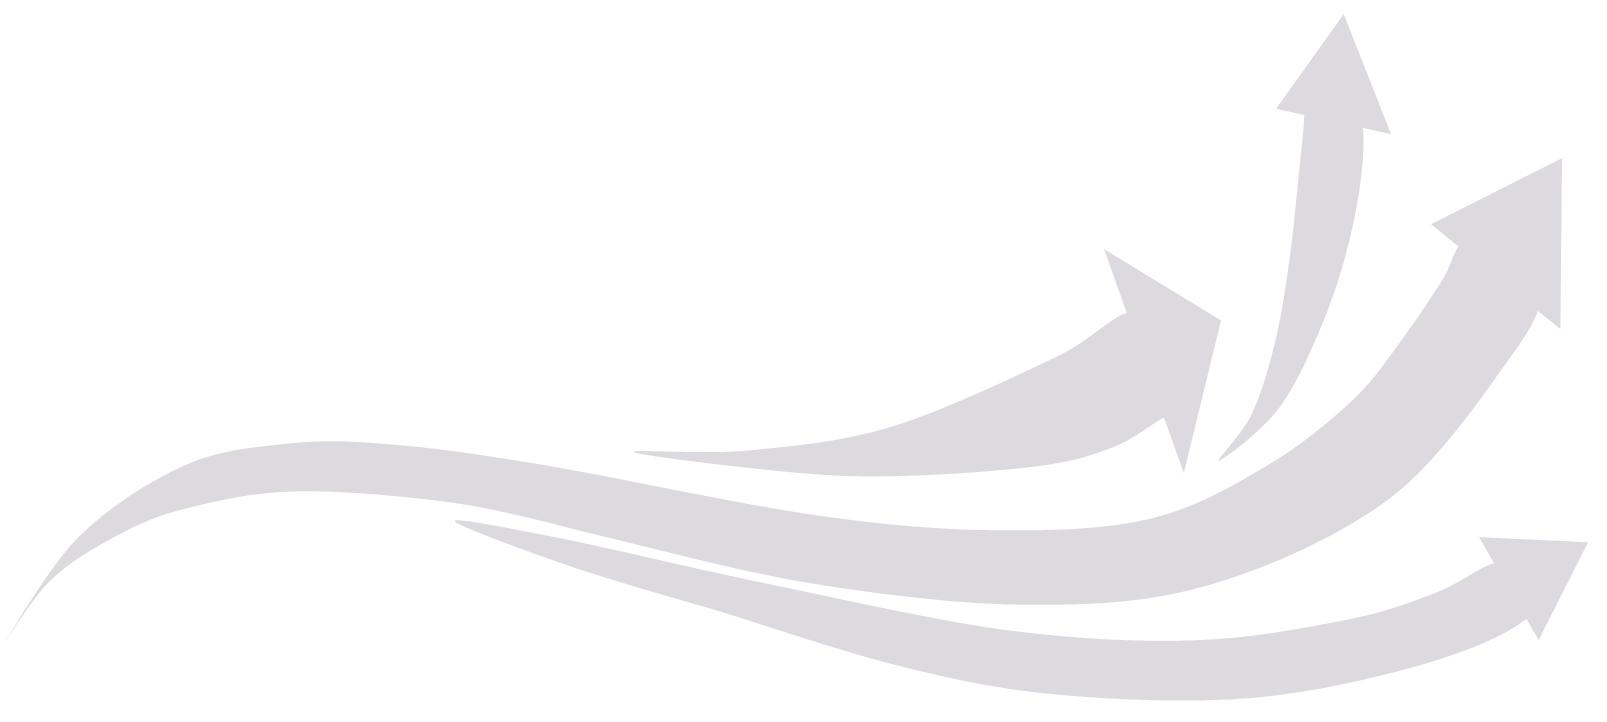 Pfeile-beige